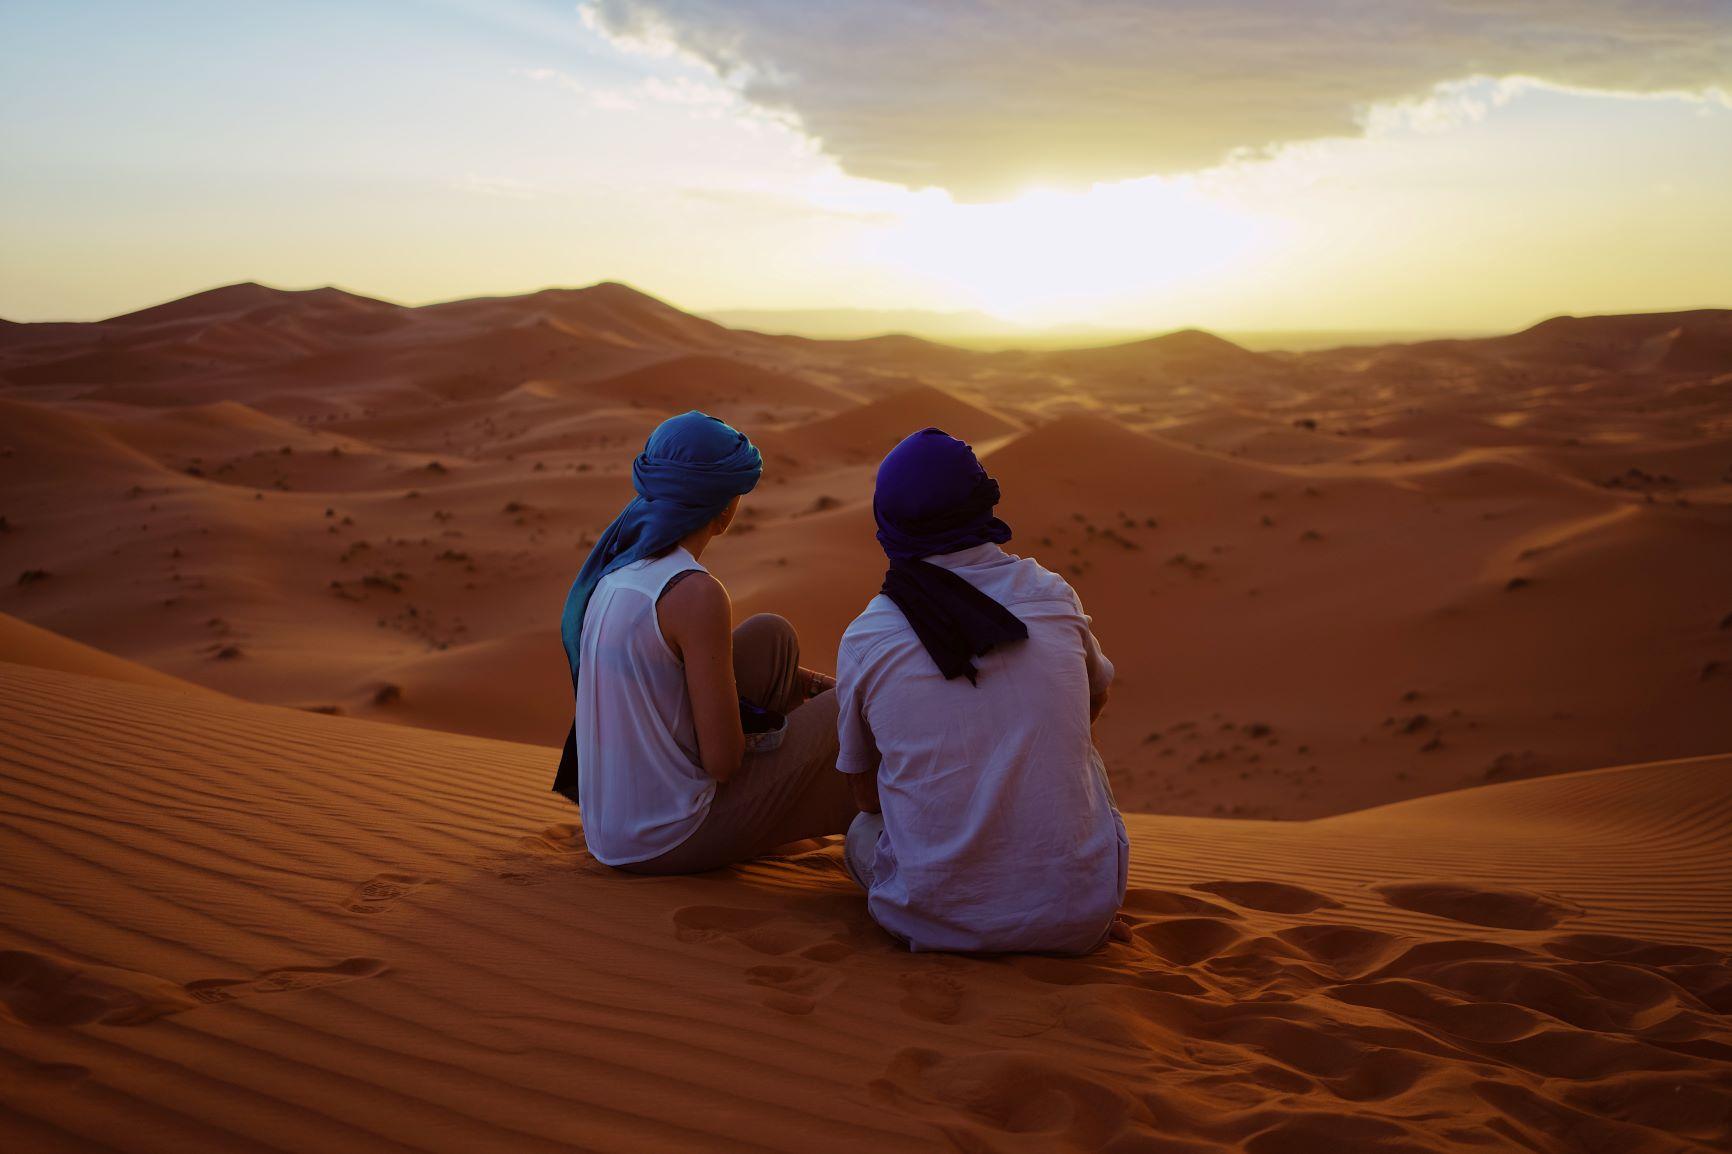 Marrakech. Lujo gastronómico. Nuba everywhere. Desierto pareja